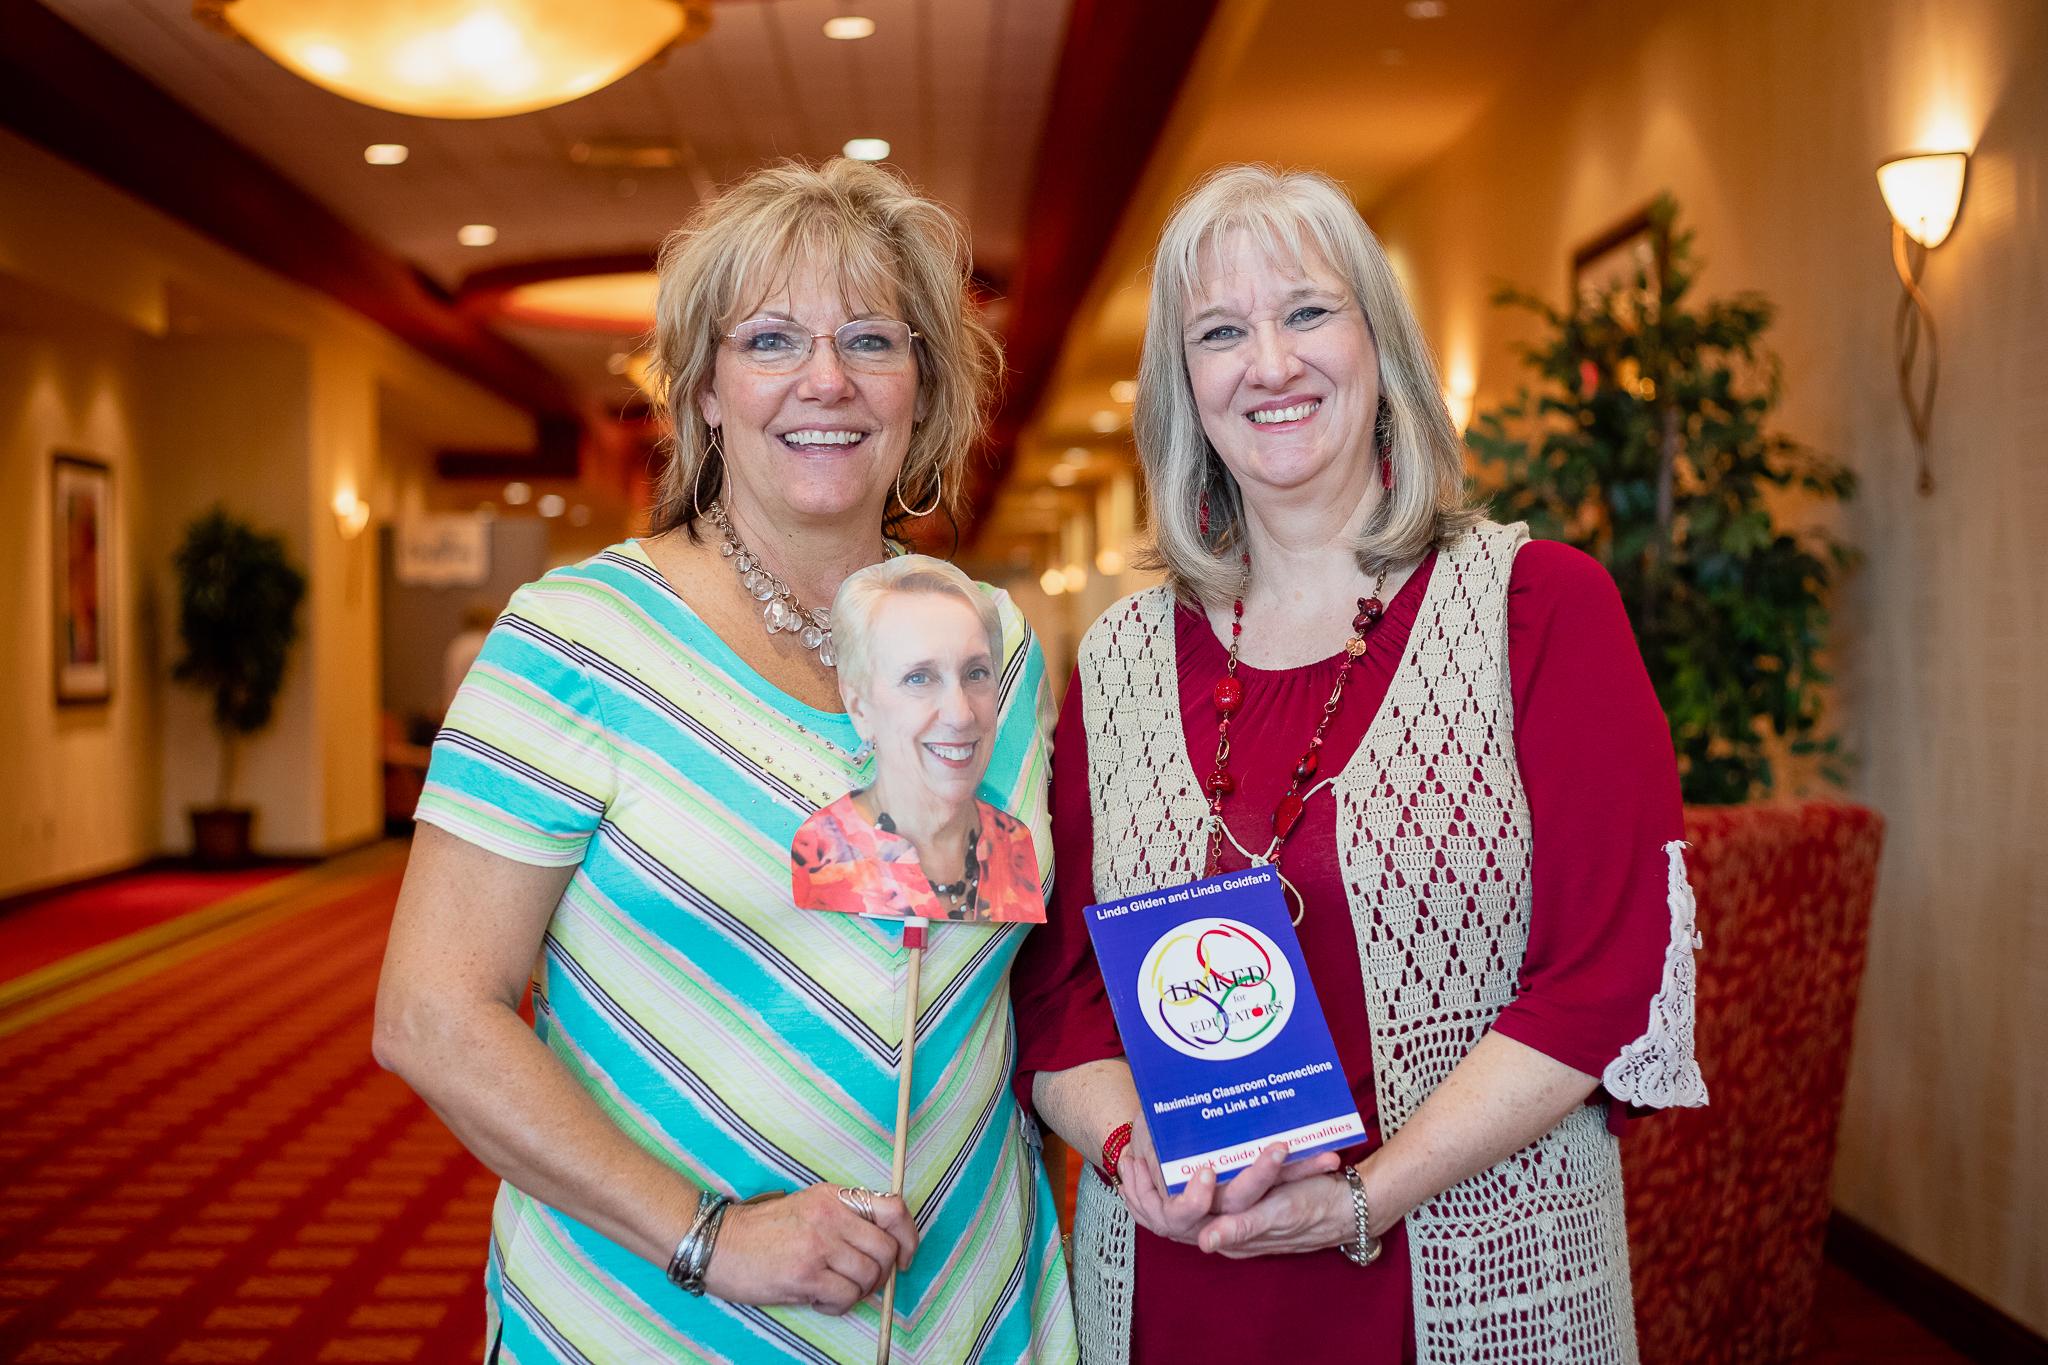 Sharon Wilharm interviews author Linda Goldfarb at CPE 2019